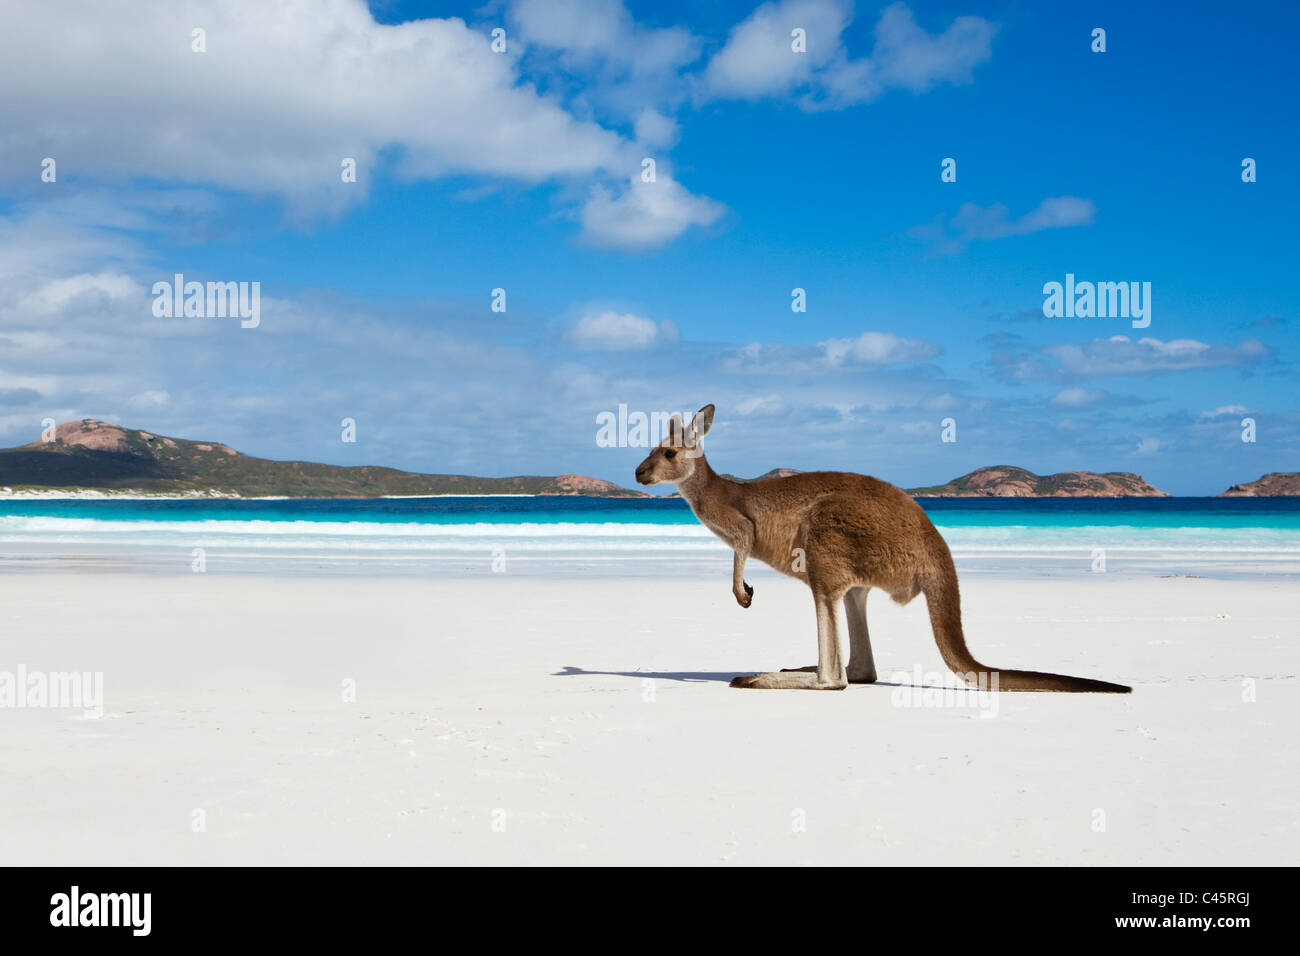 Canguro en la playa en Lucky Bay. Cape Le Grand National Park, Esperance, Australia Occidental, Australia Imagen De Stock